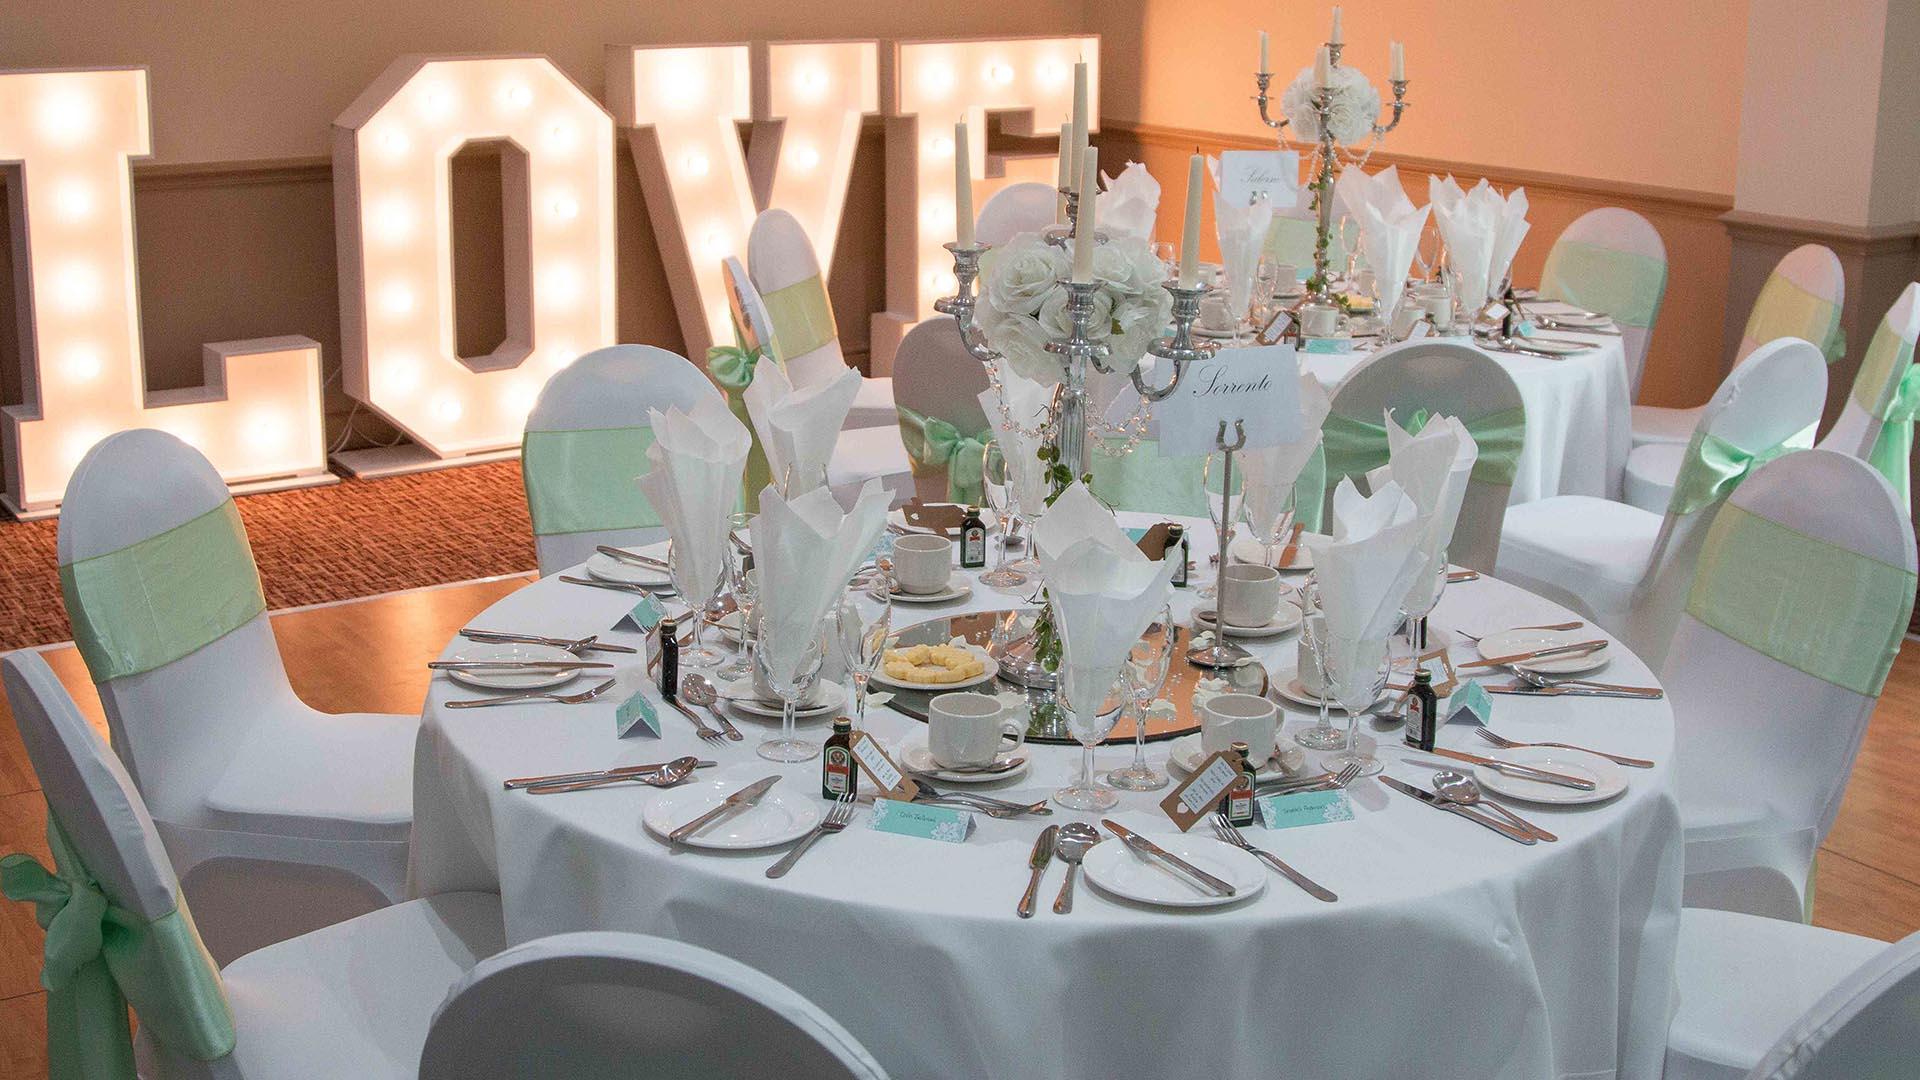 Decor 1 Wedding venues in Manchester and Cheshire Best Western Manchester Altrincham Cresta Court Hotel